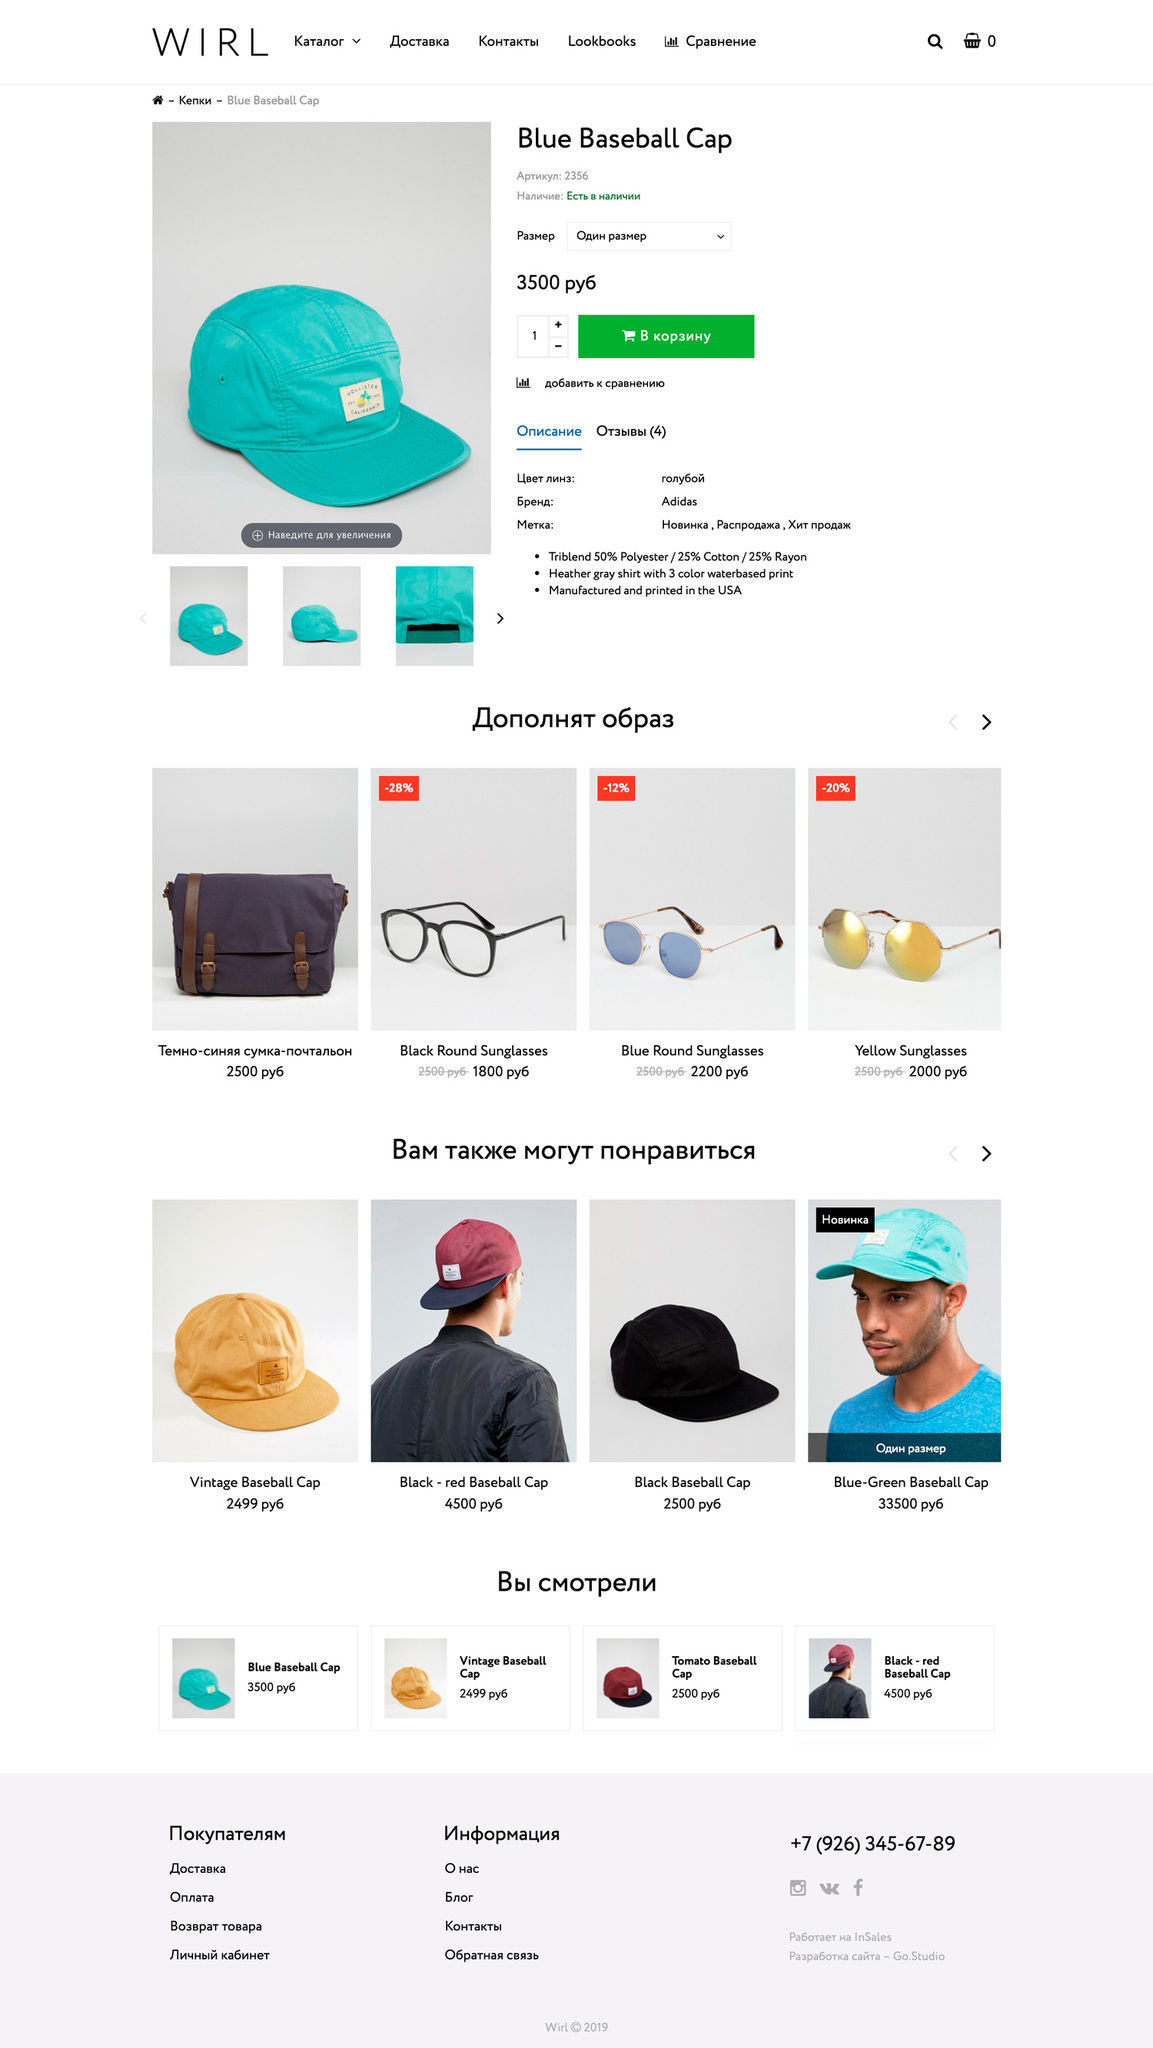 Шаблон интернет магазина - Wirl